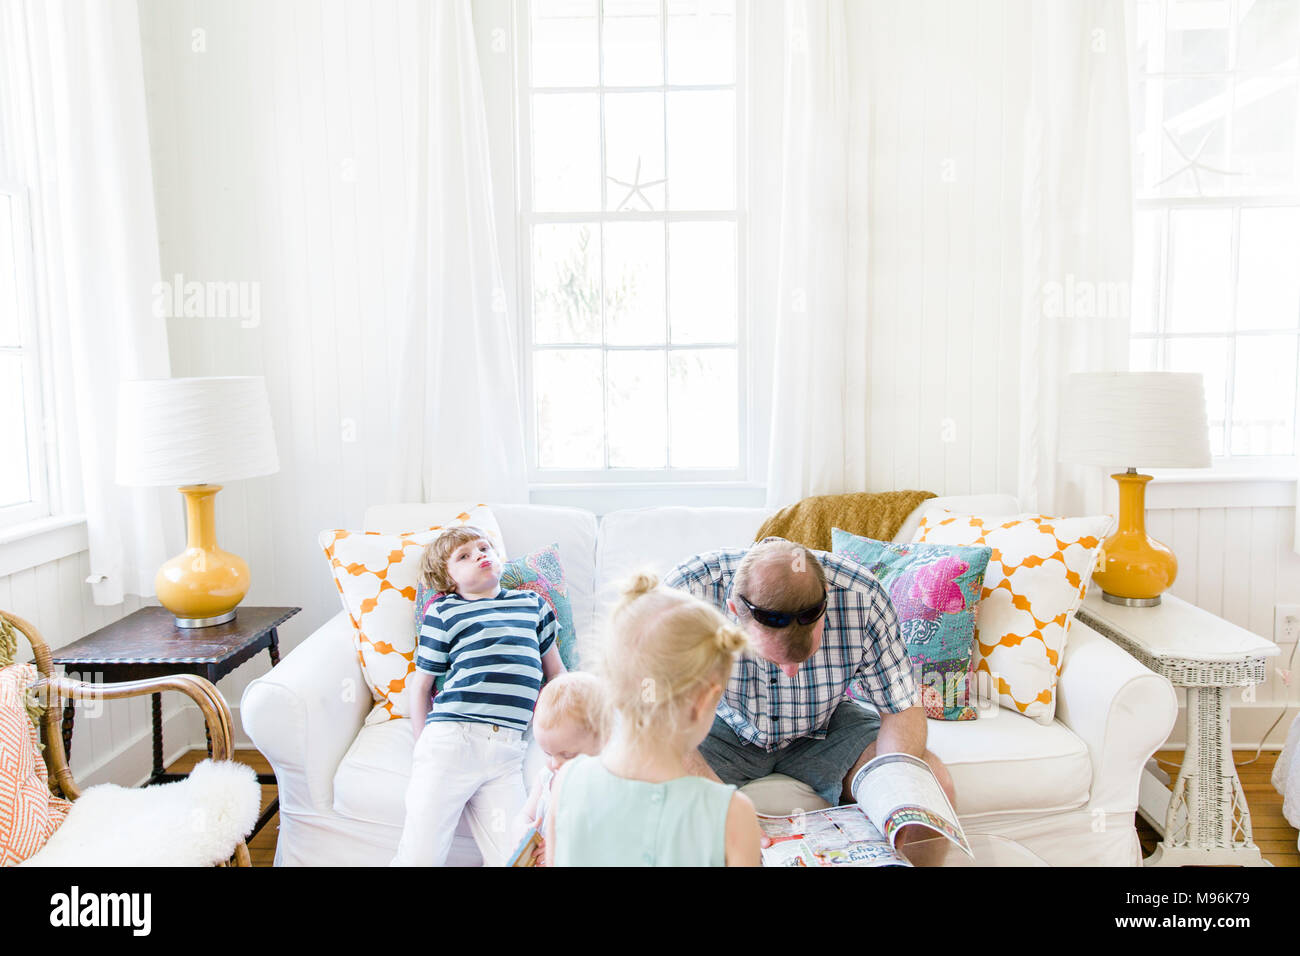 Man reading on sofa with children around him - Stock Image